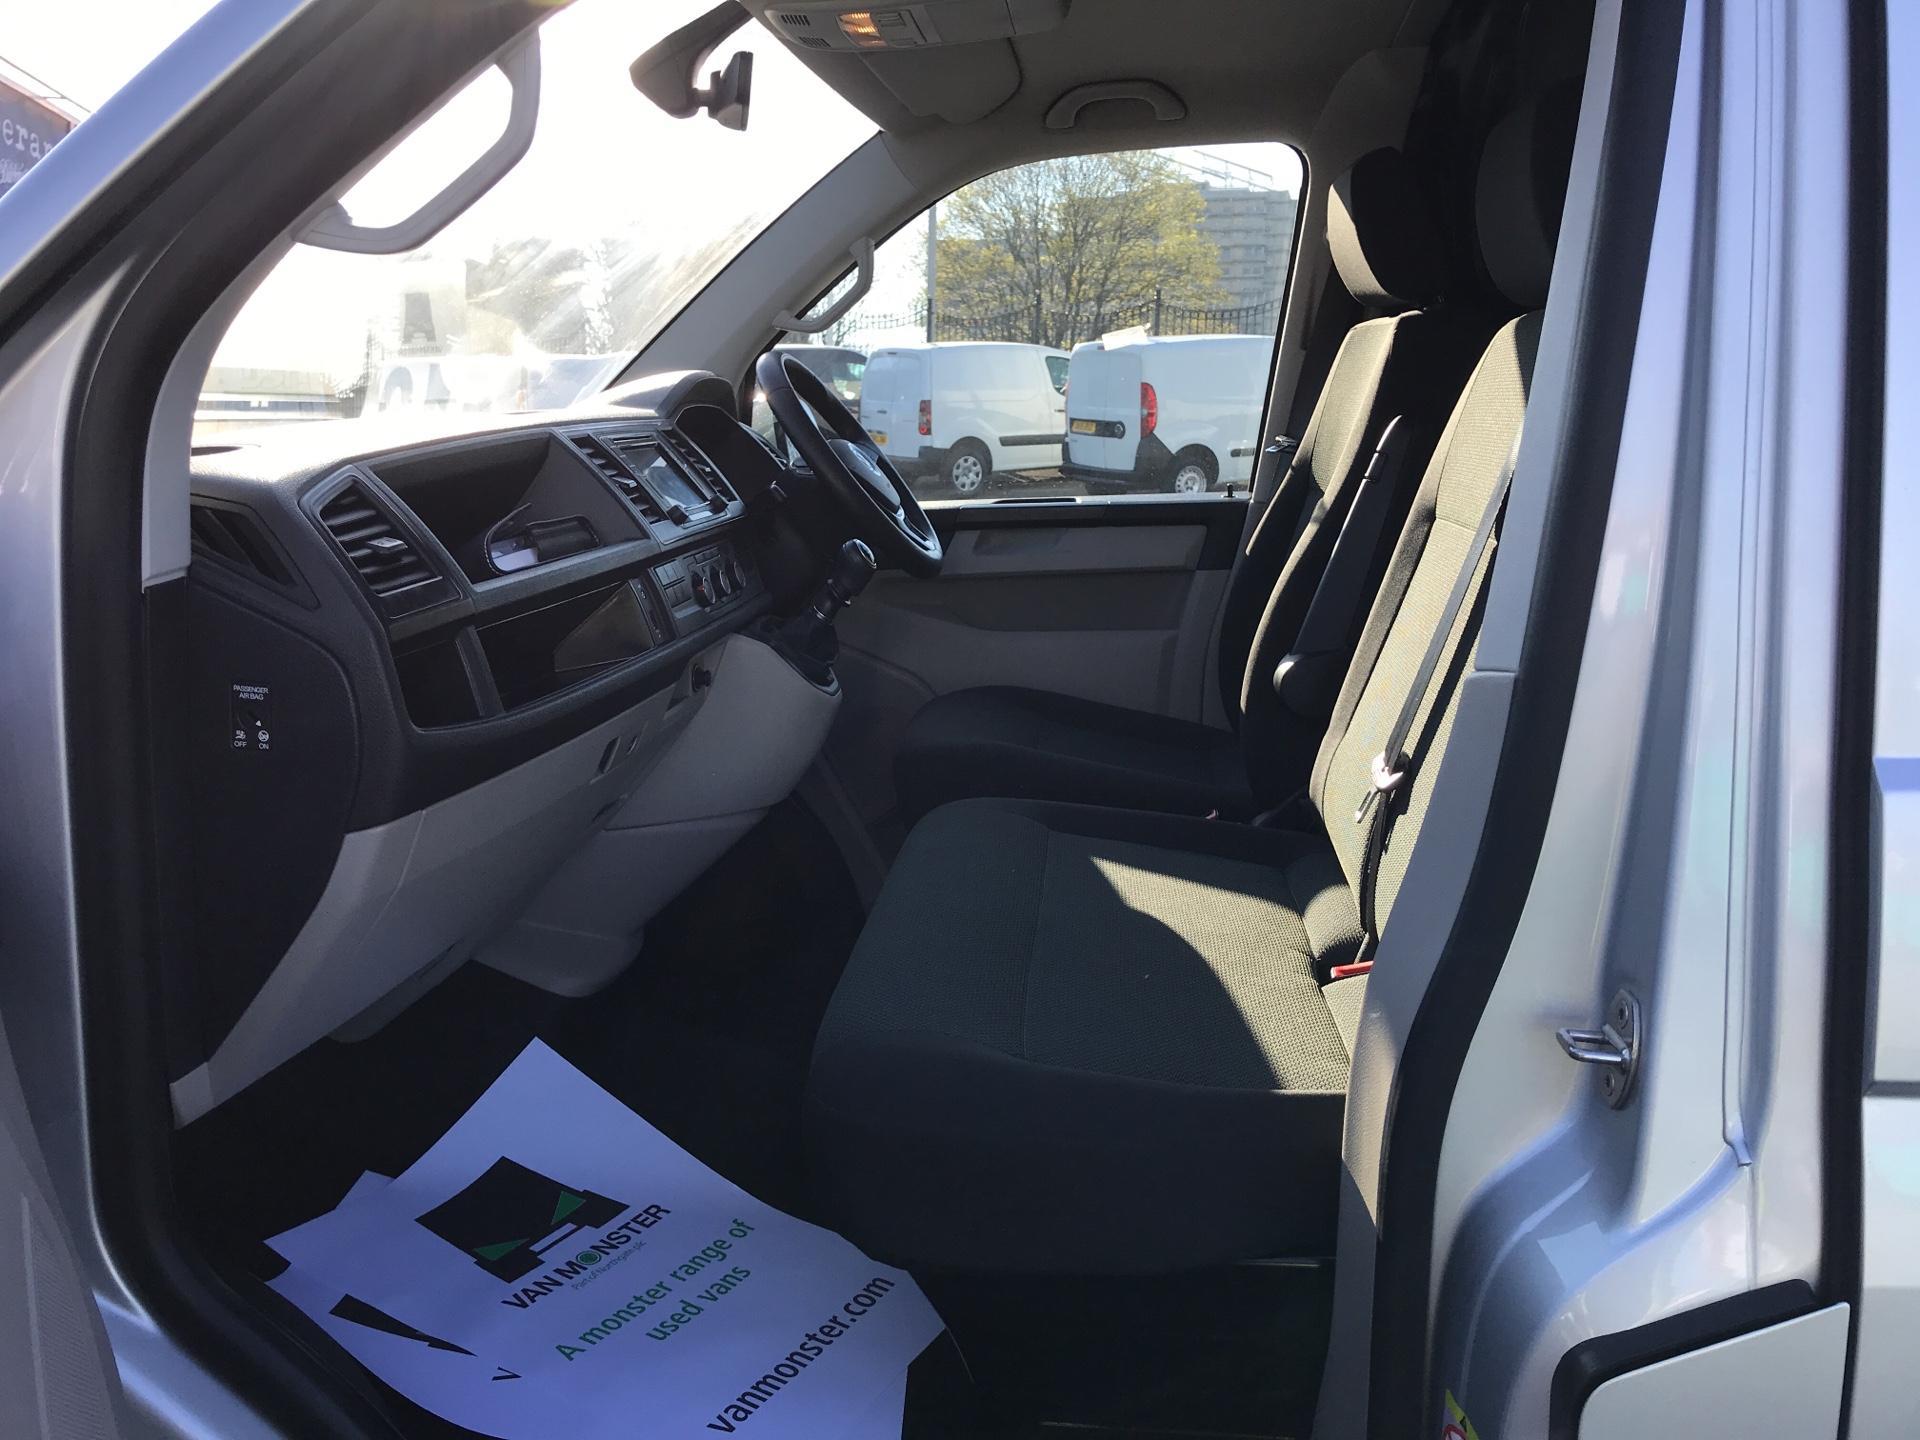 2017 Volkswagen Transporter 2.0 Tdi Bmt 102 Highline Van Euro 6  Sat/nav A/C (GJ67NHK) Image 14